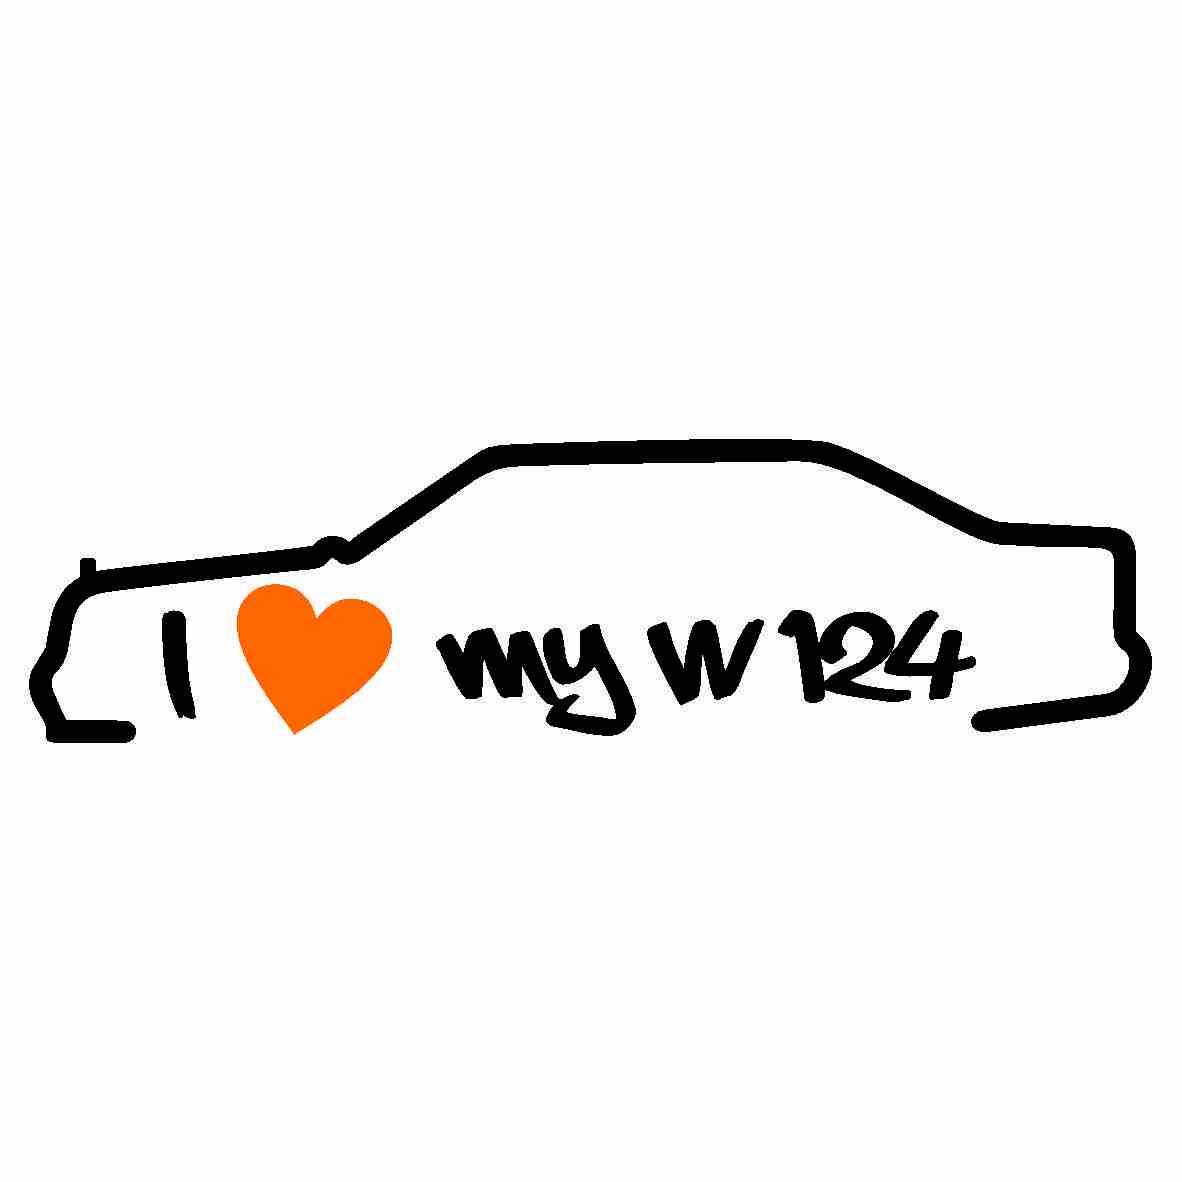 I Love My W124